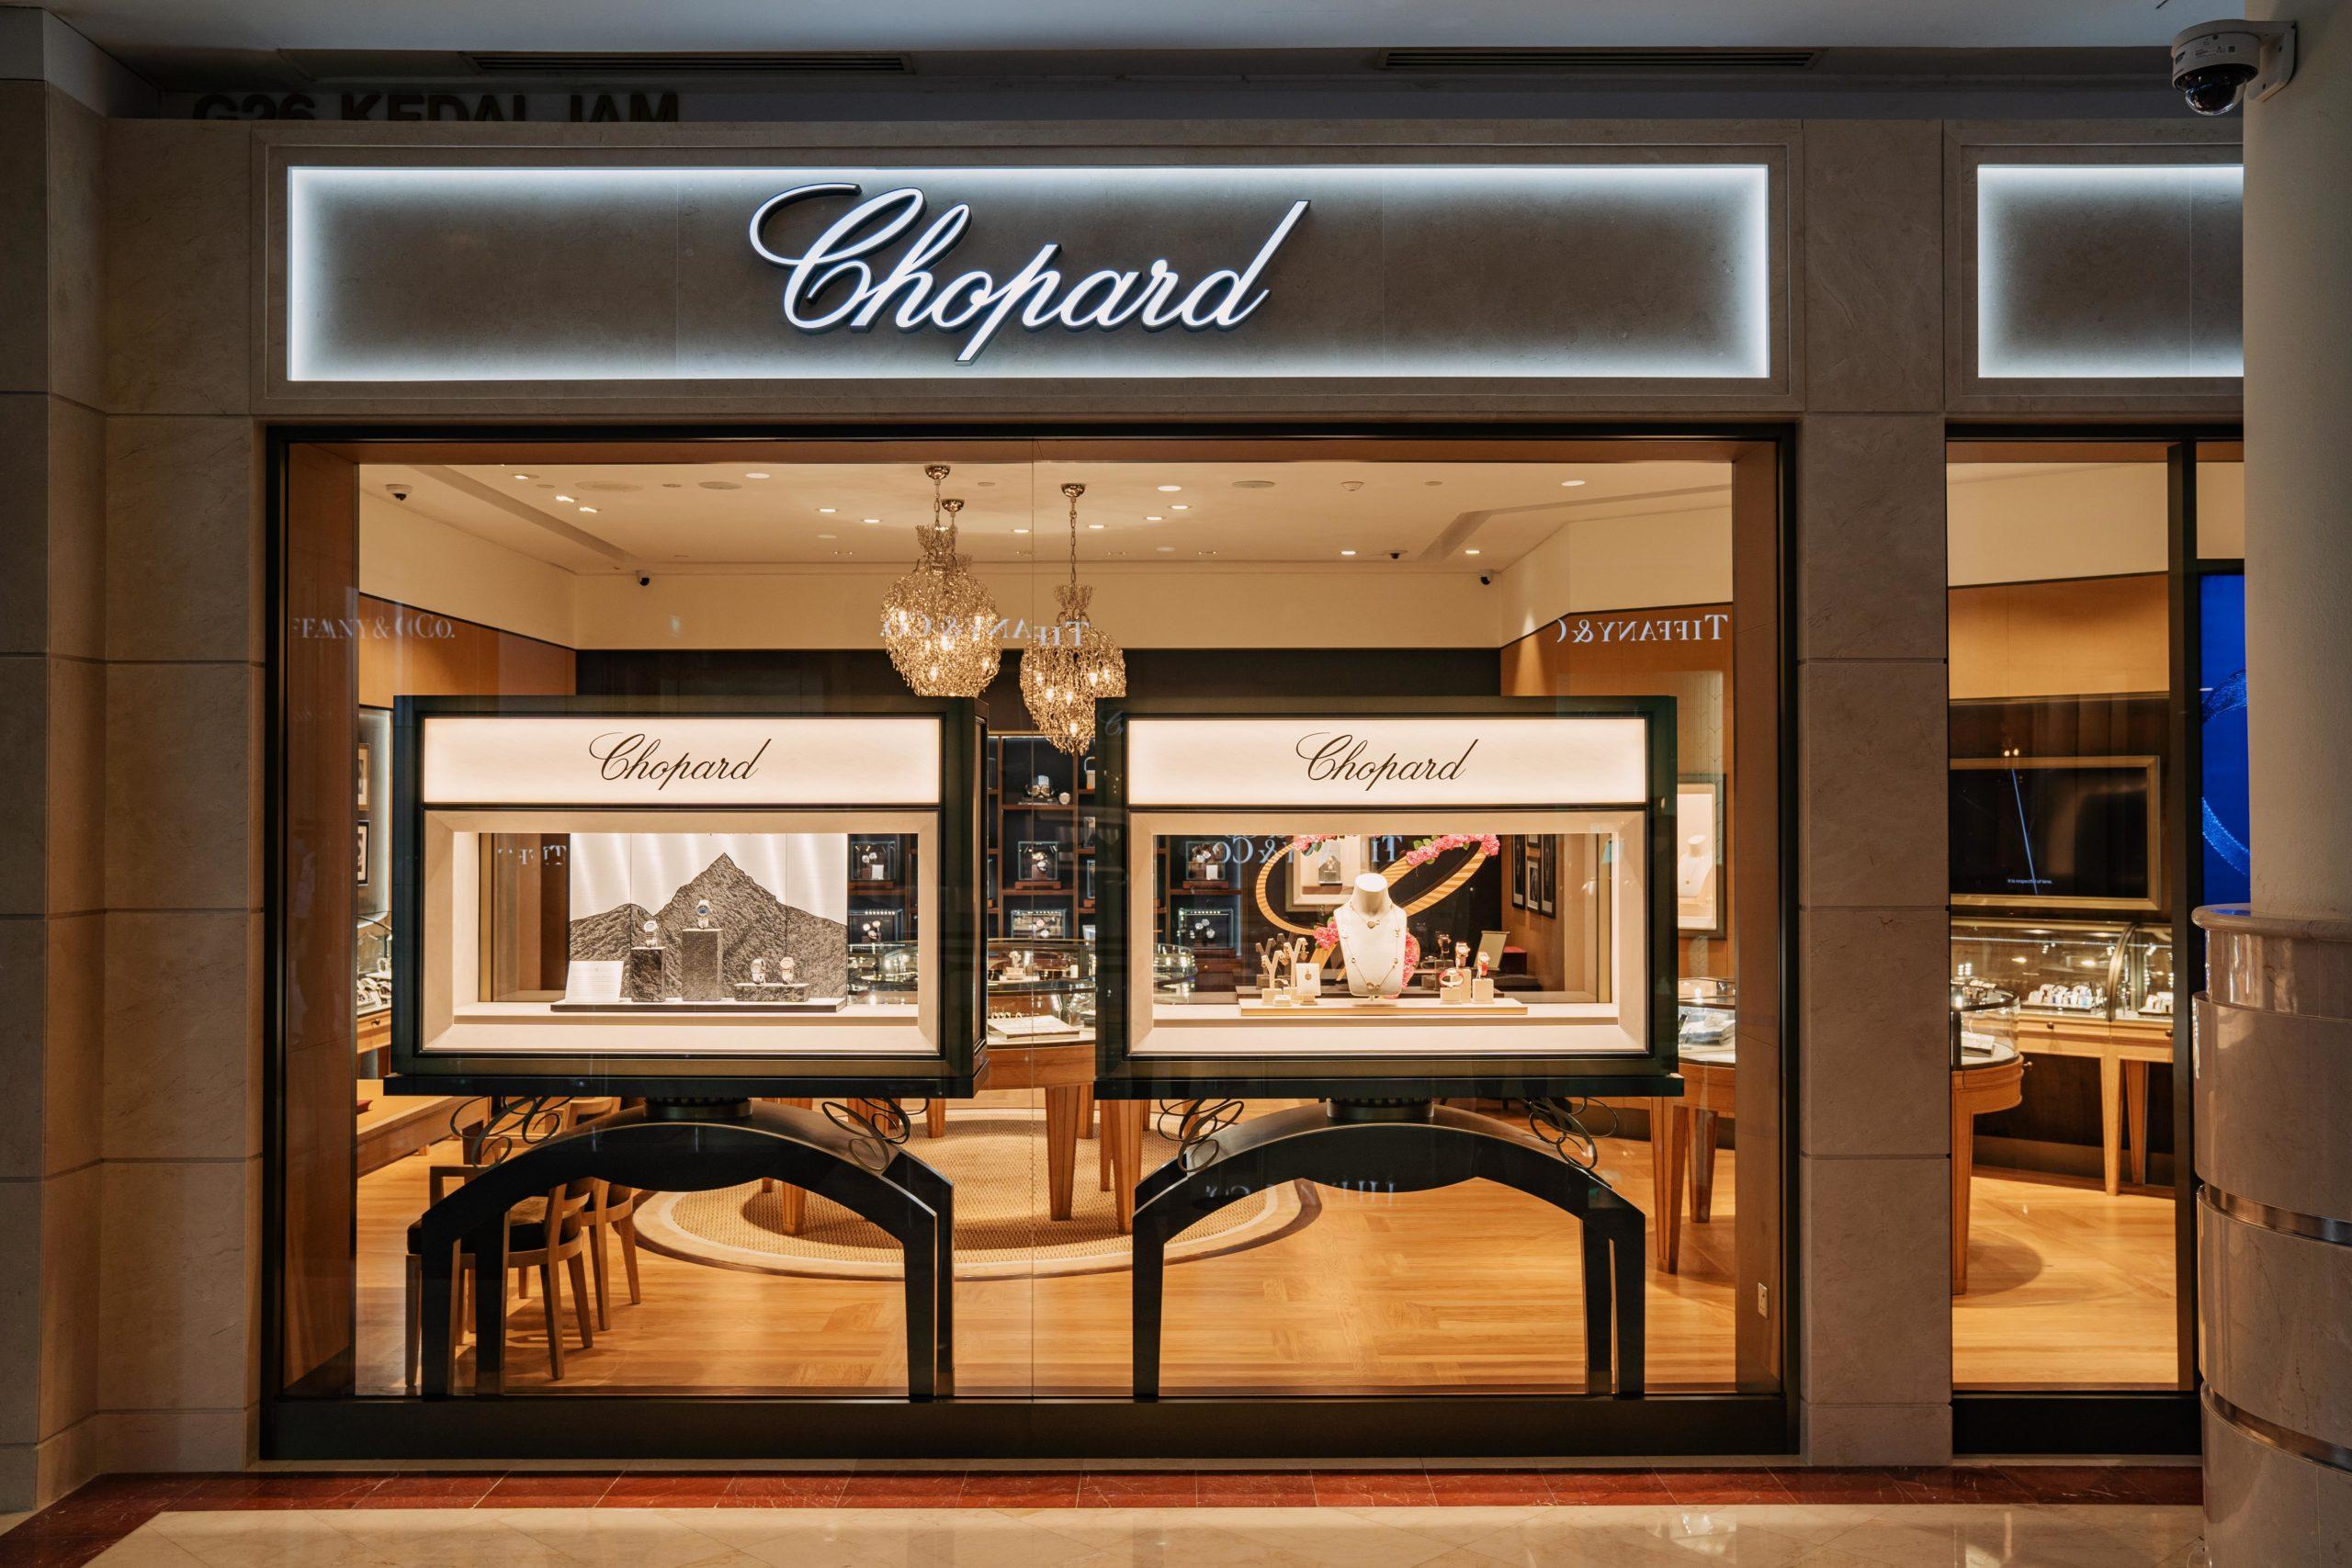 Chopard boutique exterior exudes class and sophistication (Photo: Chopard)